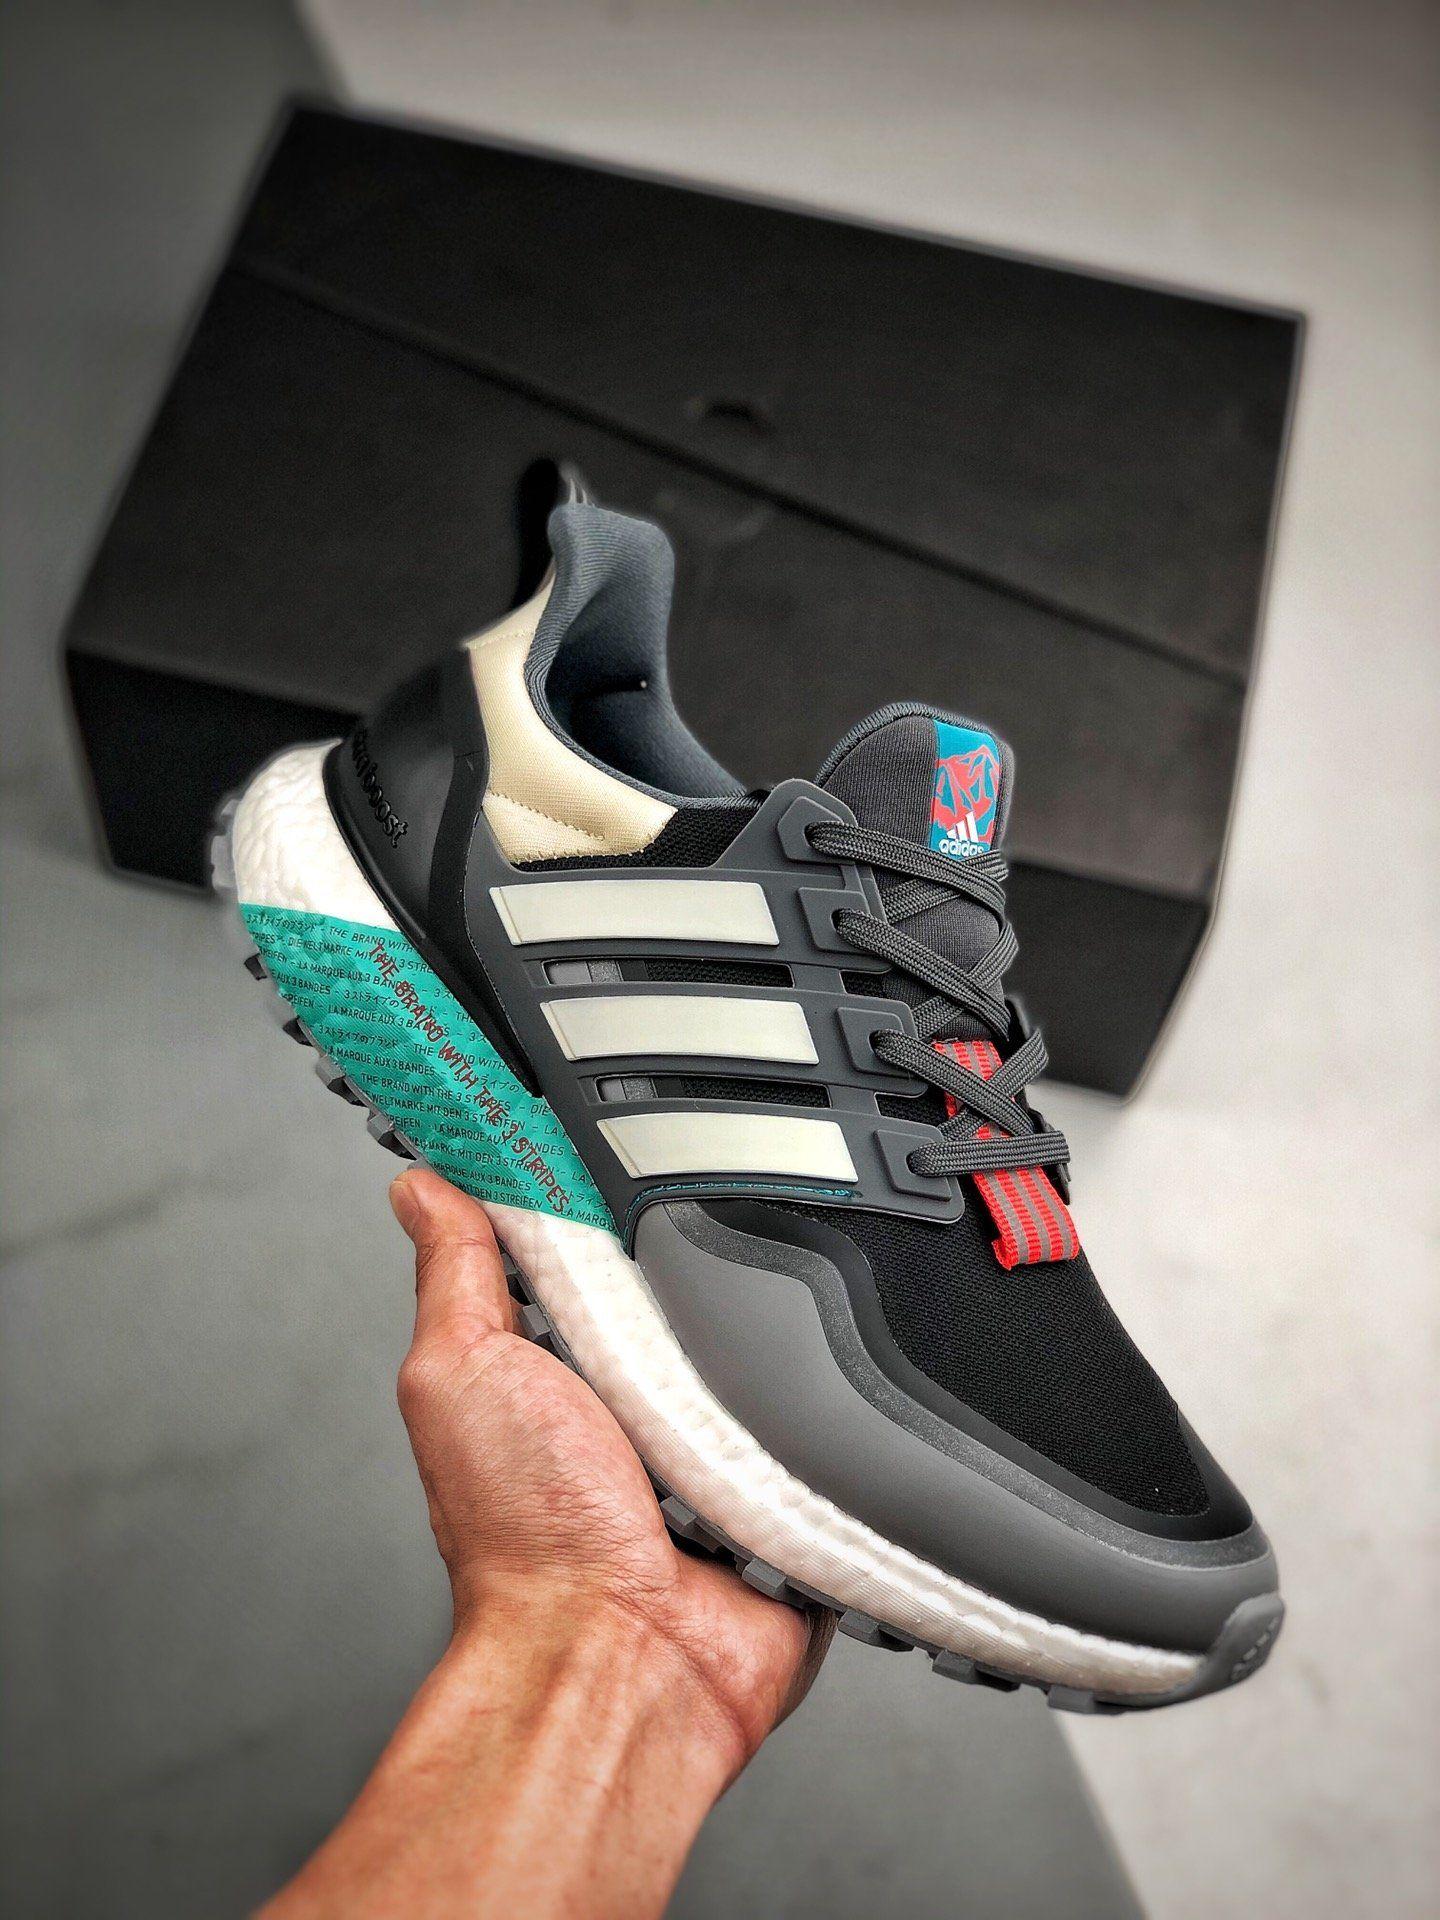 Adidas Ultra Boost All Terrain 4 0 In 2020 Adidas Adidas Ultra Boost Sneakers